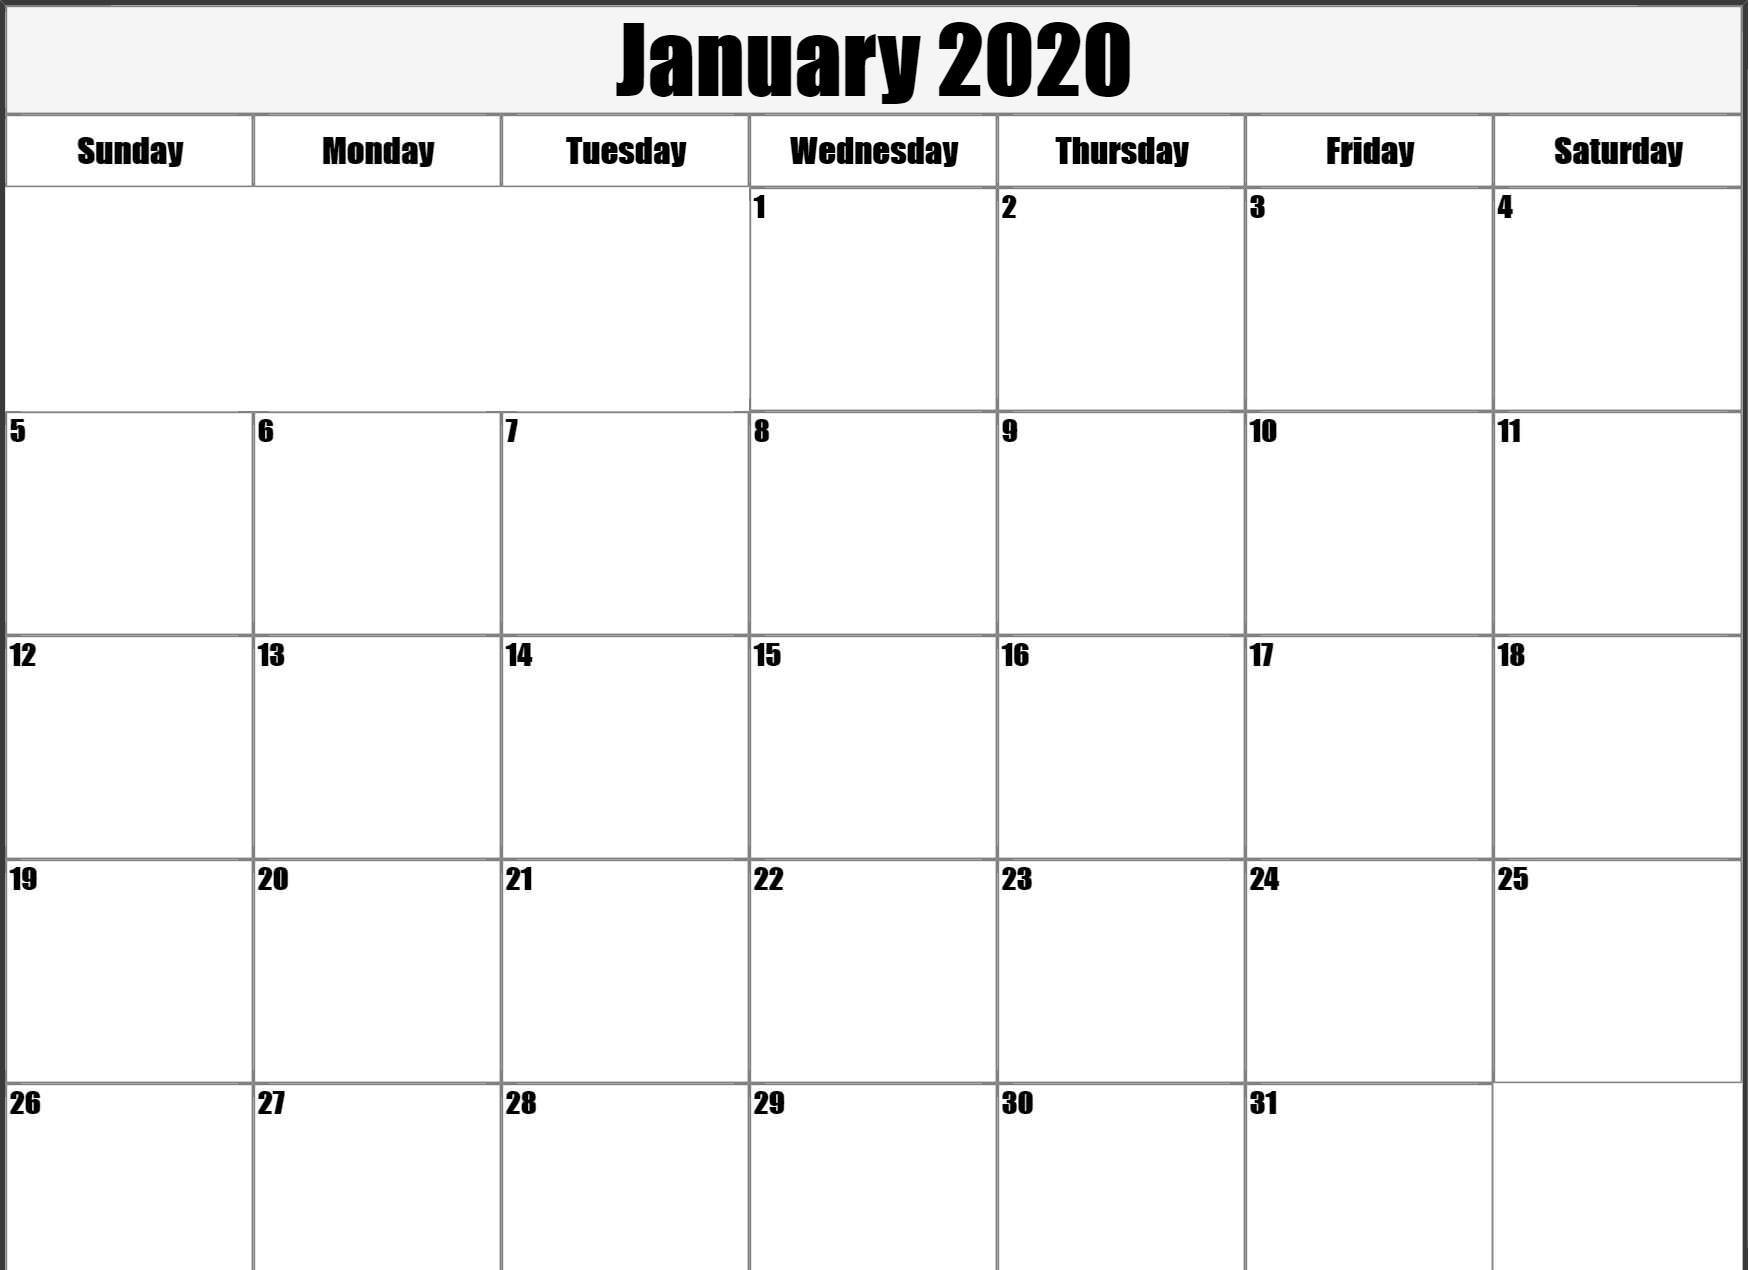 Free Blank January 2020 Calendar Printable Pdf, Word, Excel